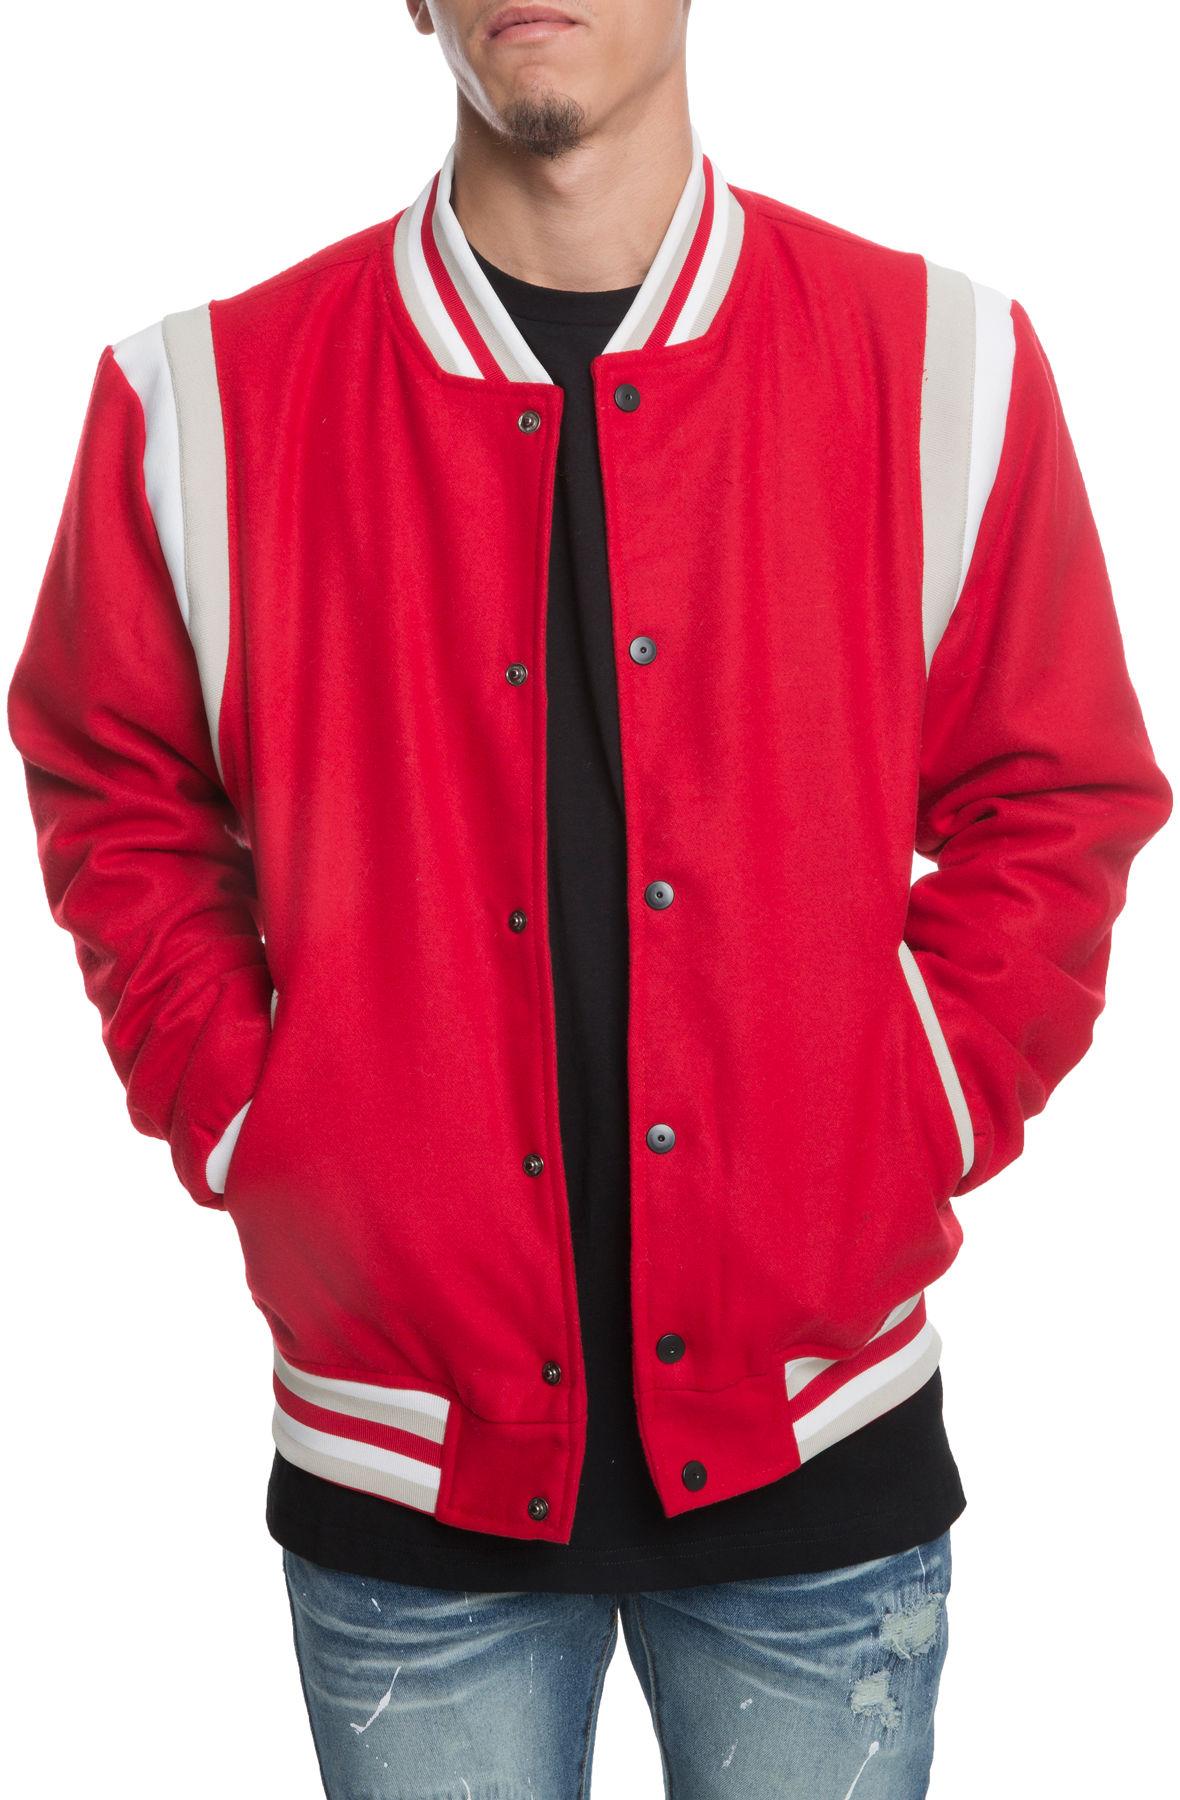 Image of The Westlake Varsity Jacket in Red